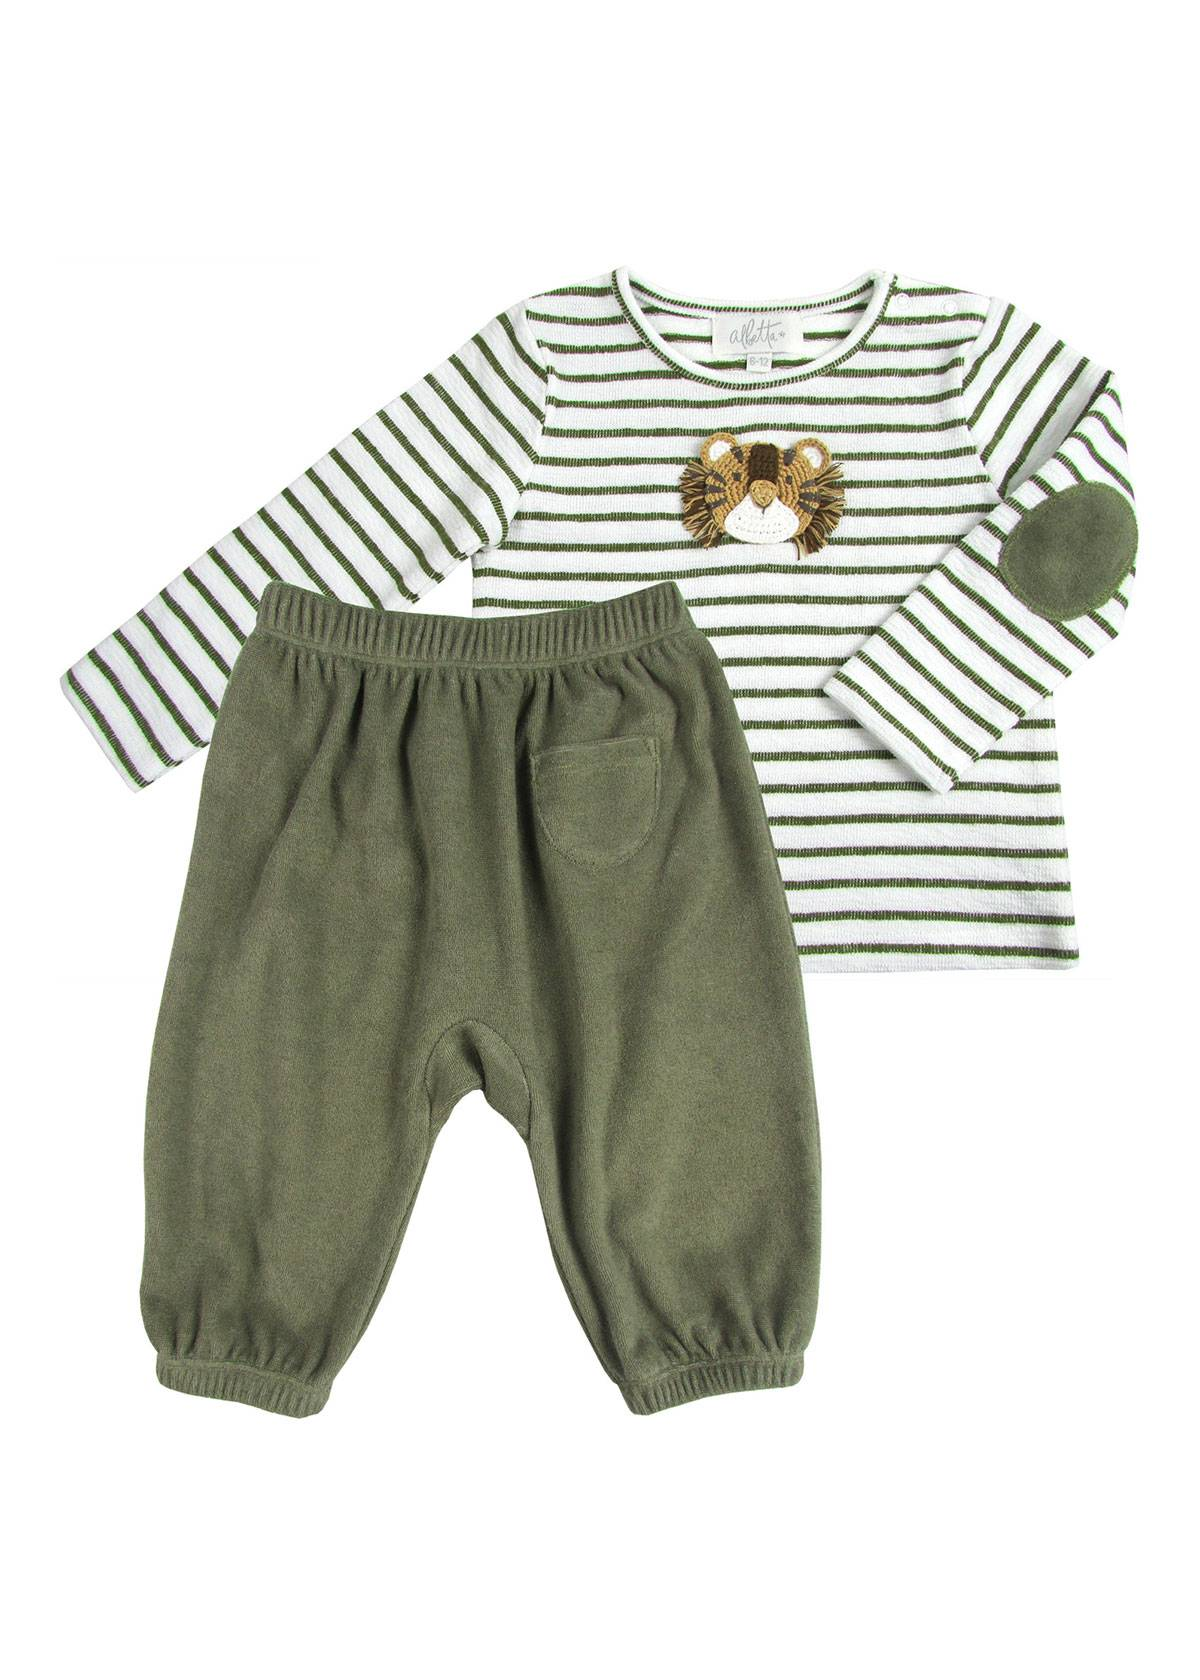 Albetta Crochet Tiger Playset 2 Piece  - male - GREEN - Size: 12-18 Months